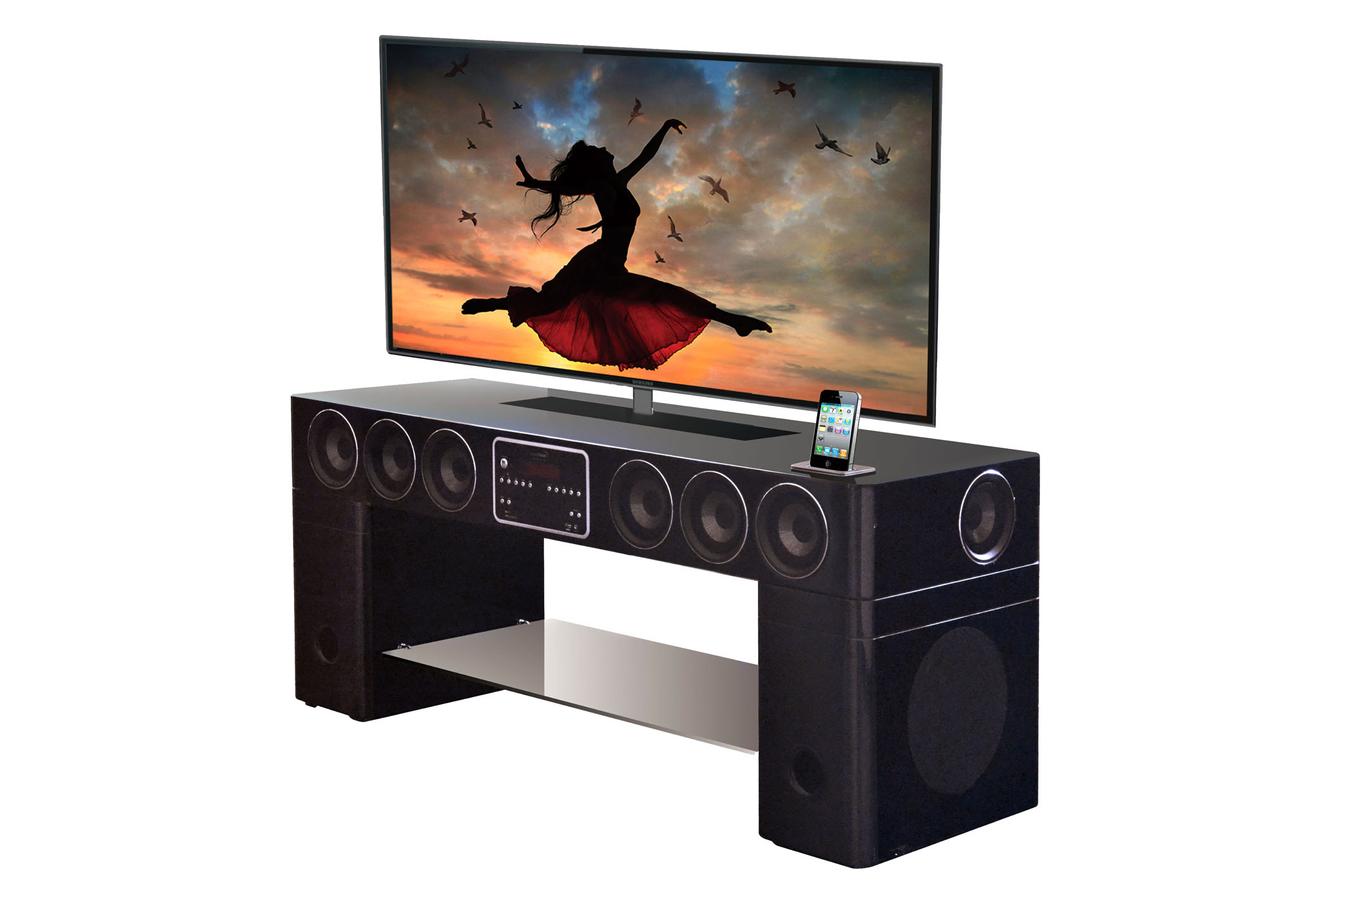 Meuble Tele Hifi Integre Maison Design Wiblia Com # Meuble Tv Hifi Integre